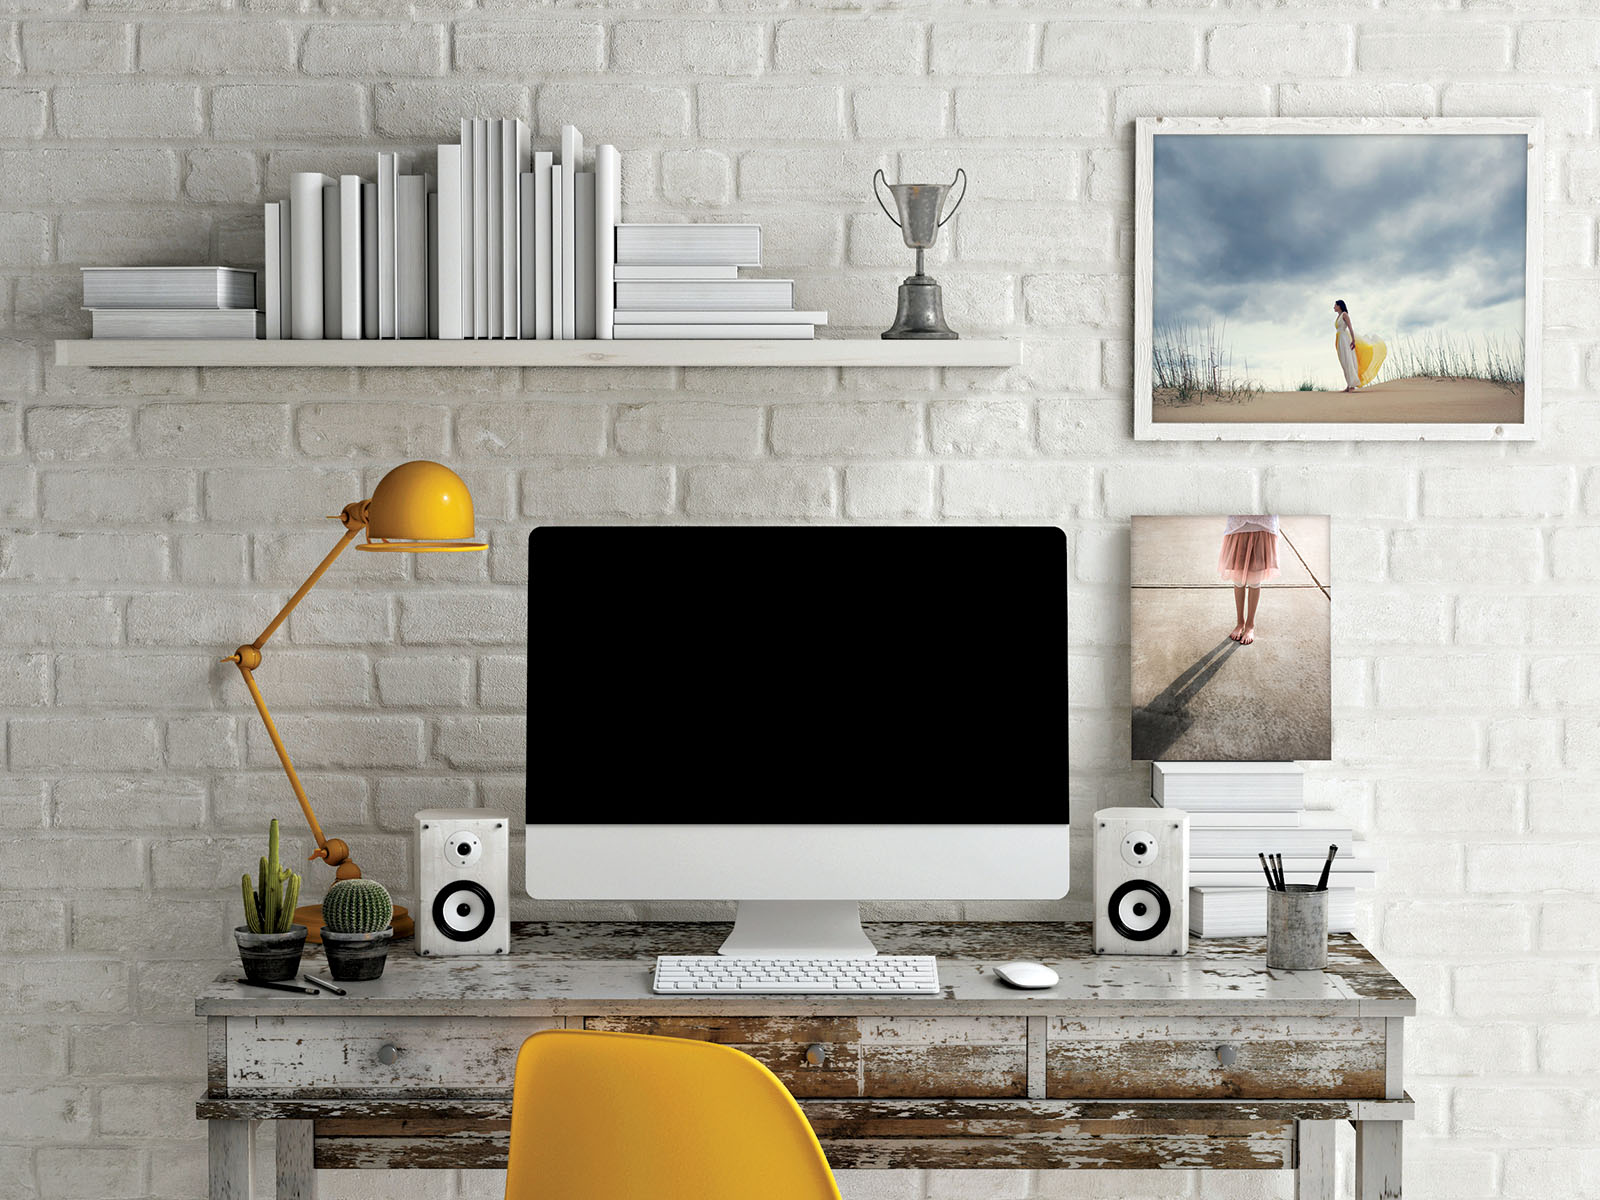 https://i1.wp.com/www.clickinmoms.com/click/wp-content/uploads/2016/12/distressed-desk-against-a-white-brick-wall.jpg